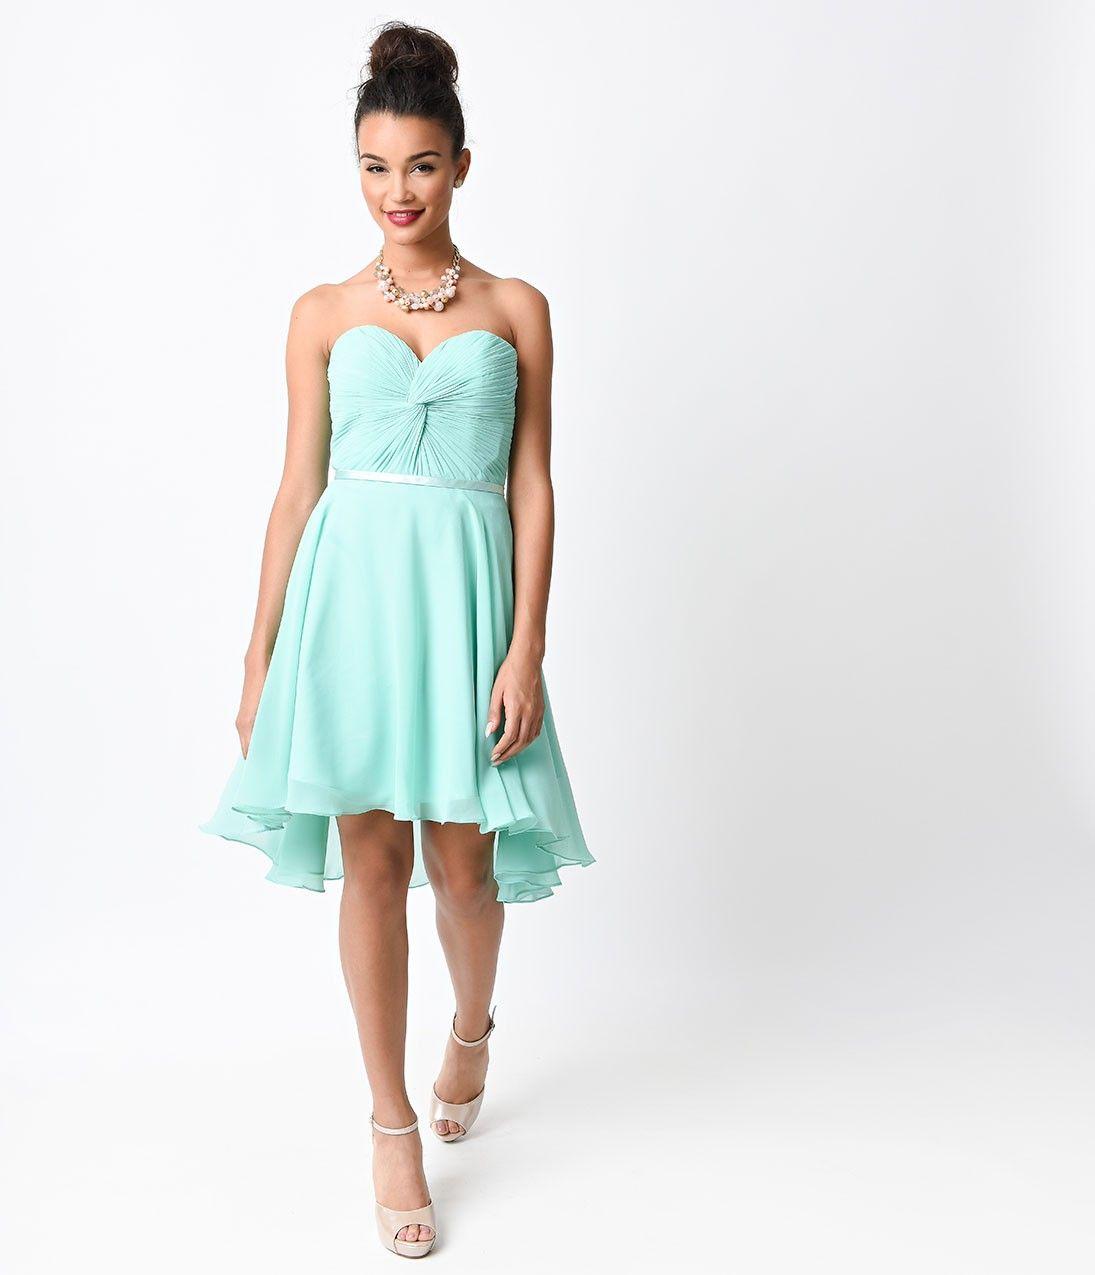 Mint chiffon strapless sweetheart corset short dress vintage